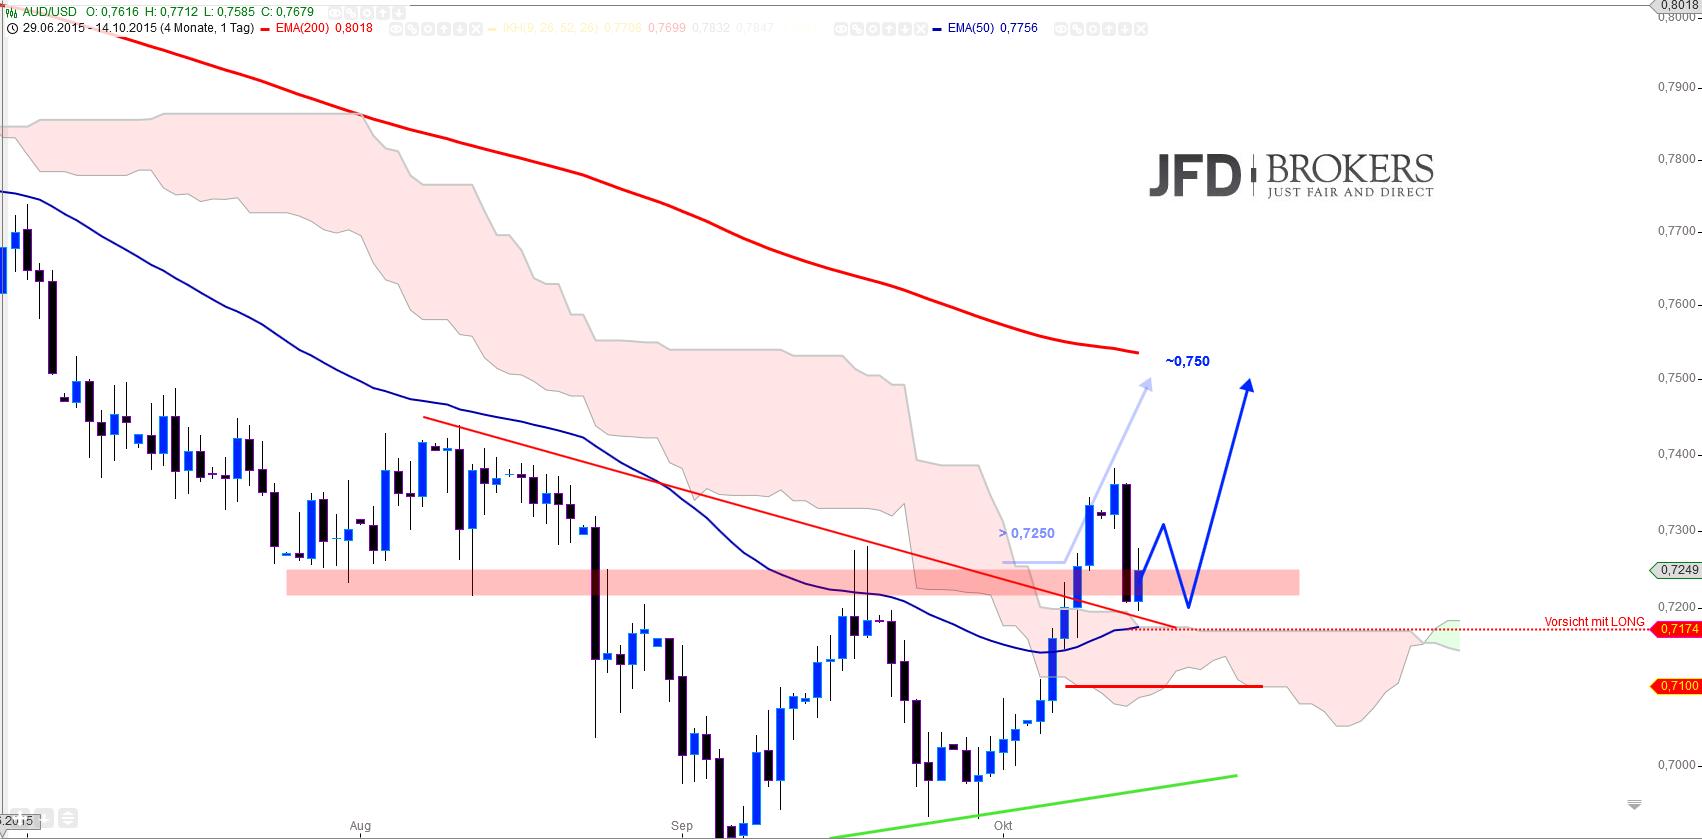 AUD-USD-daily-2-Kauf-Chance-Kommentar-JFD-Brokers-GodmodeTrader.de-1